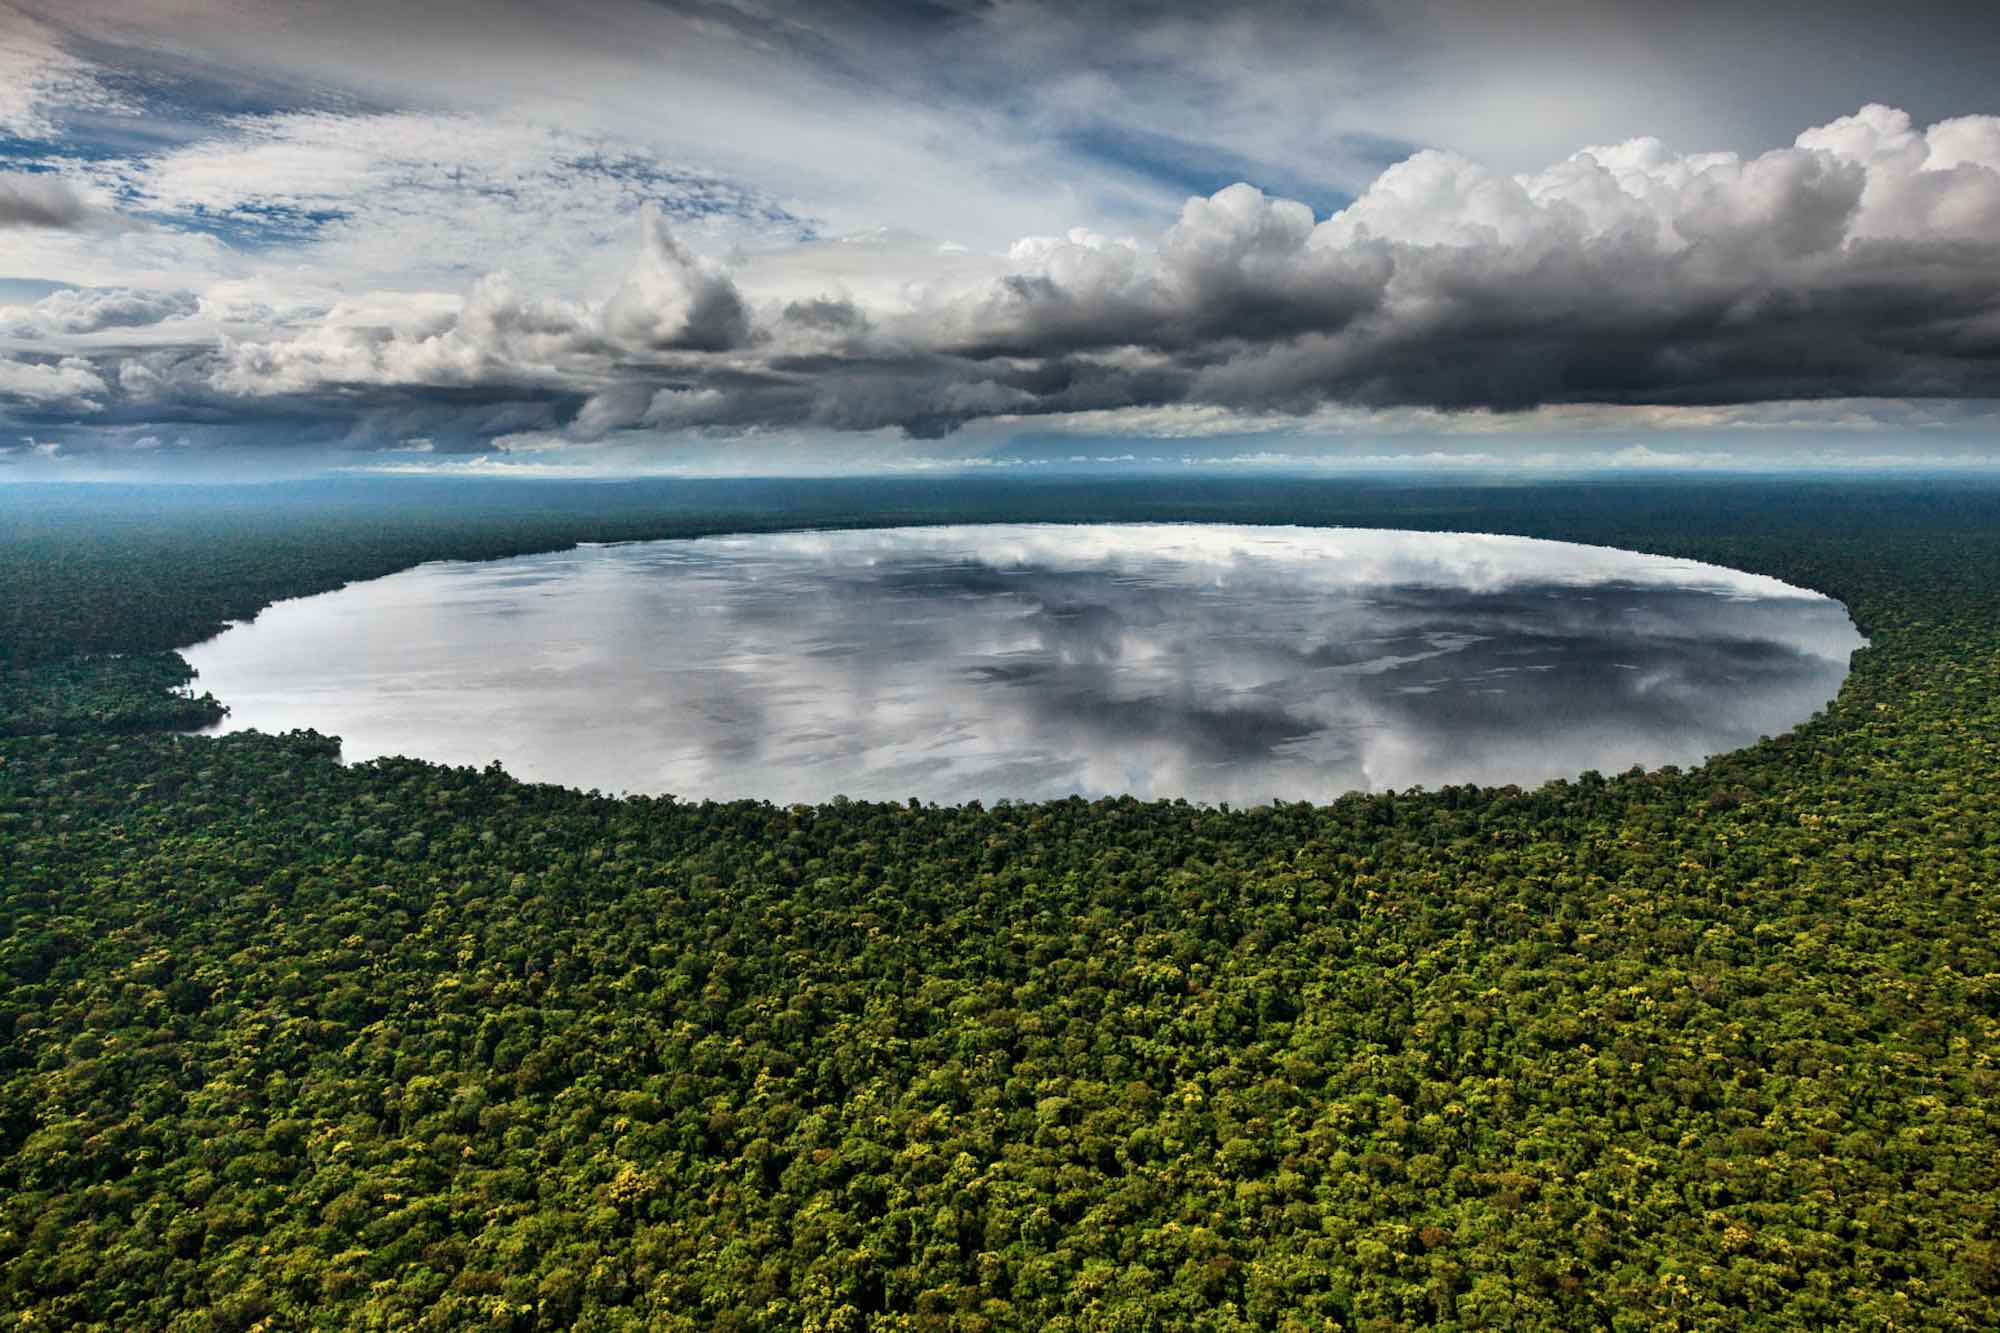 Lake Télé - Yann Arthus-Bertrand